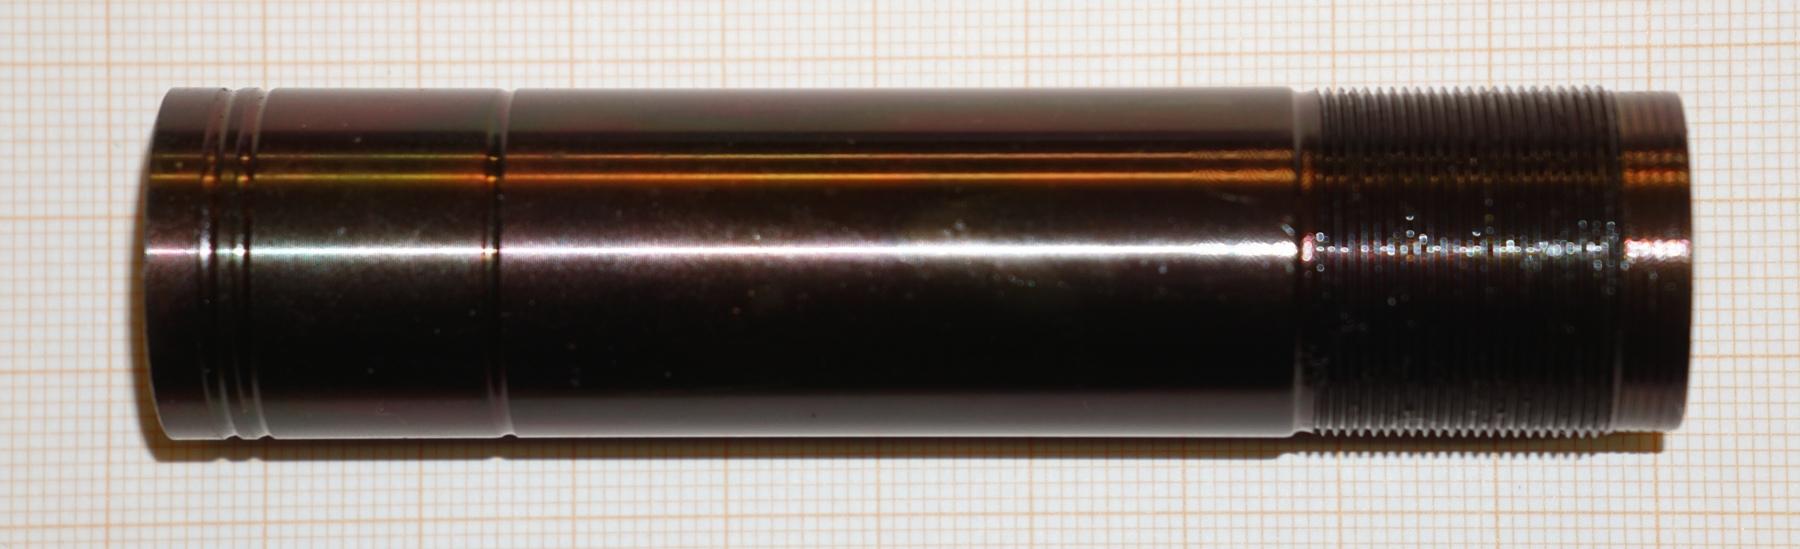 "UnA 12ga 0.740"" IM Mossberg M835/935"